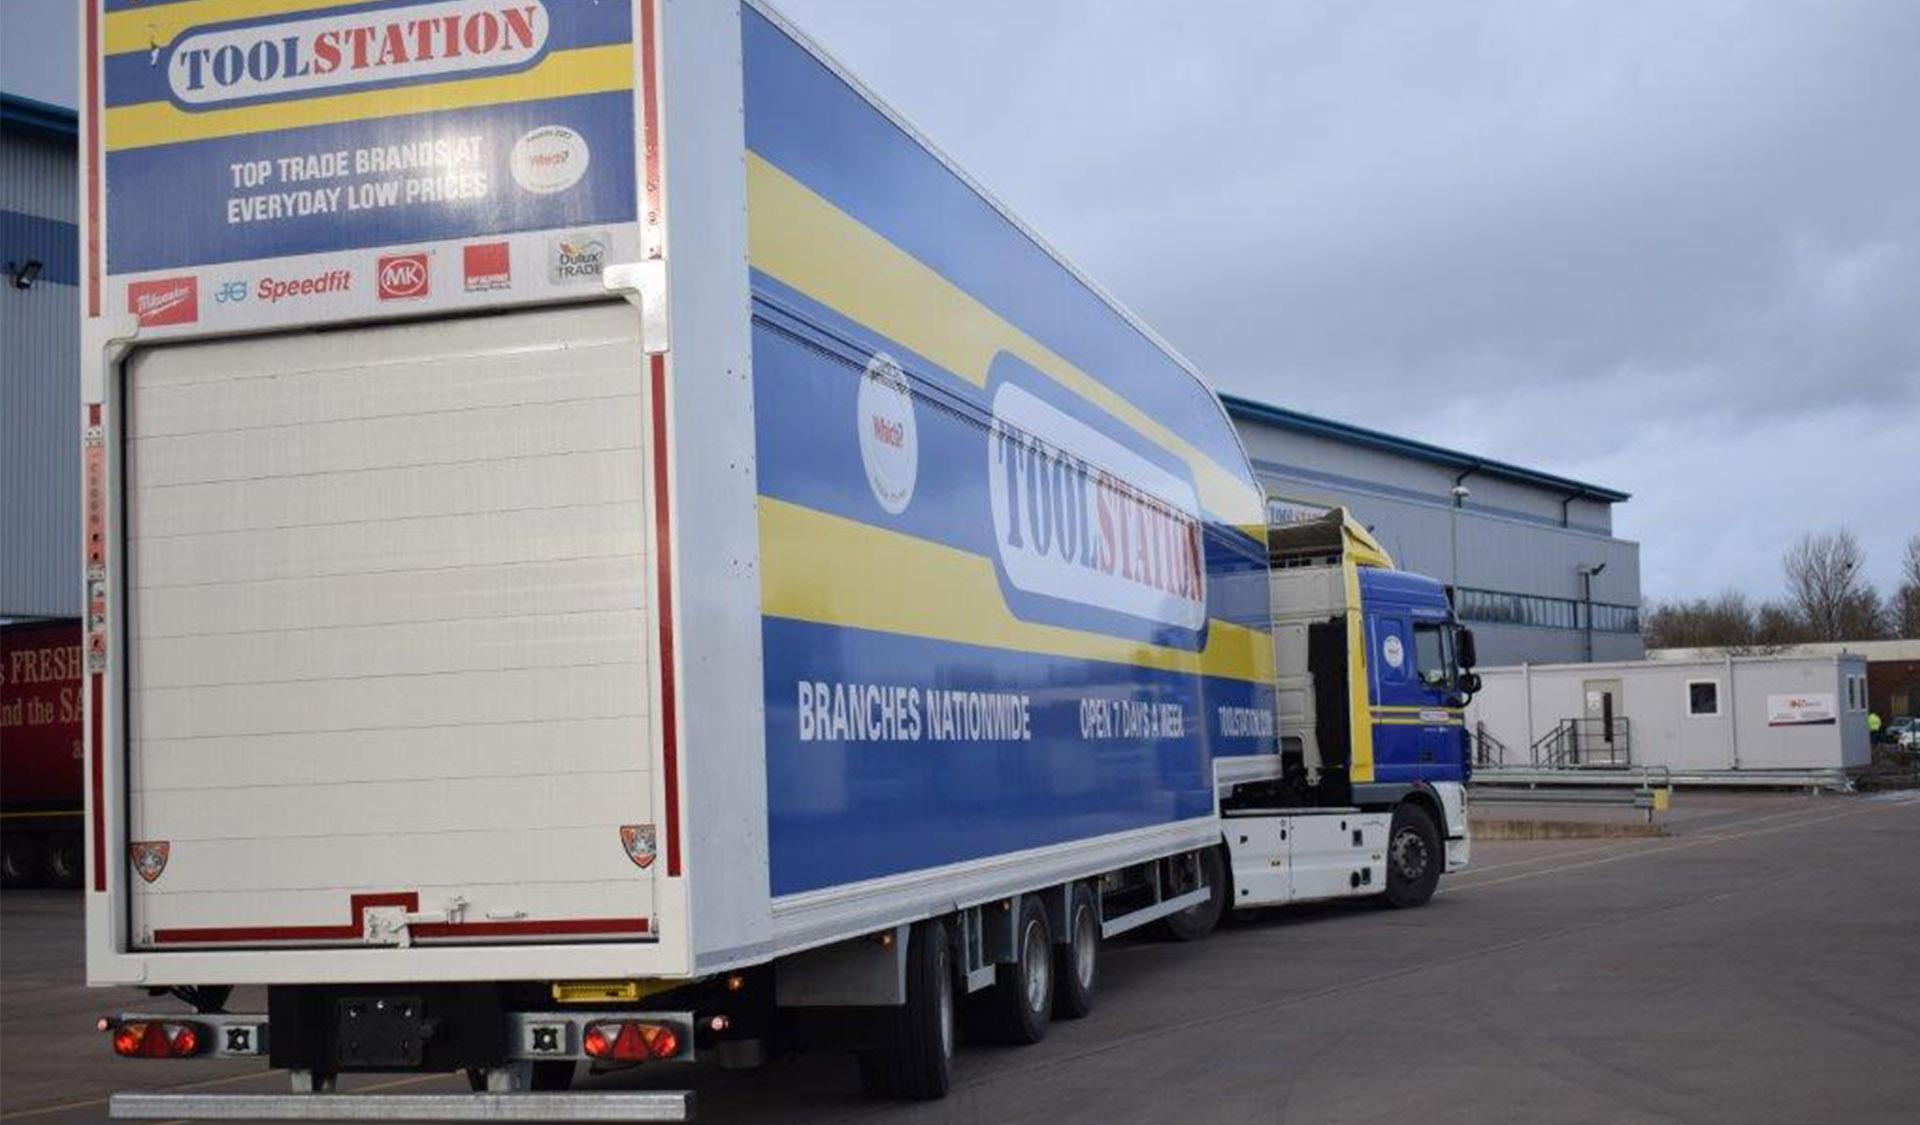 Case study - Howard Tenens 3PL logistics longer semi trailer LST double deck ToolStation rear